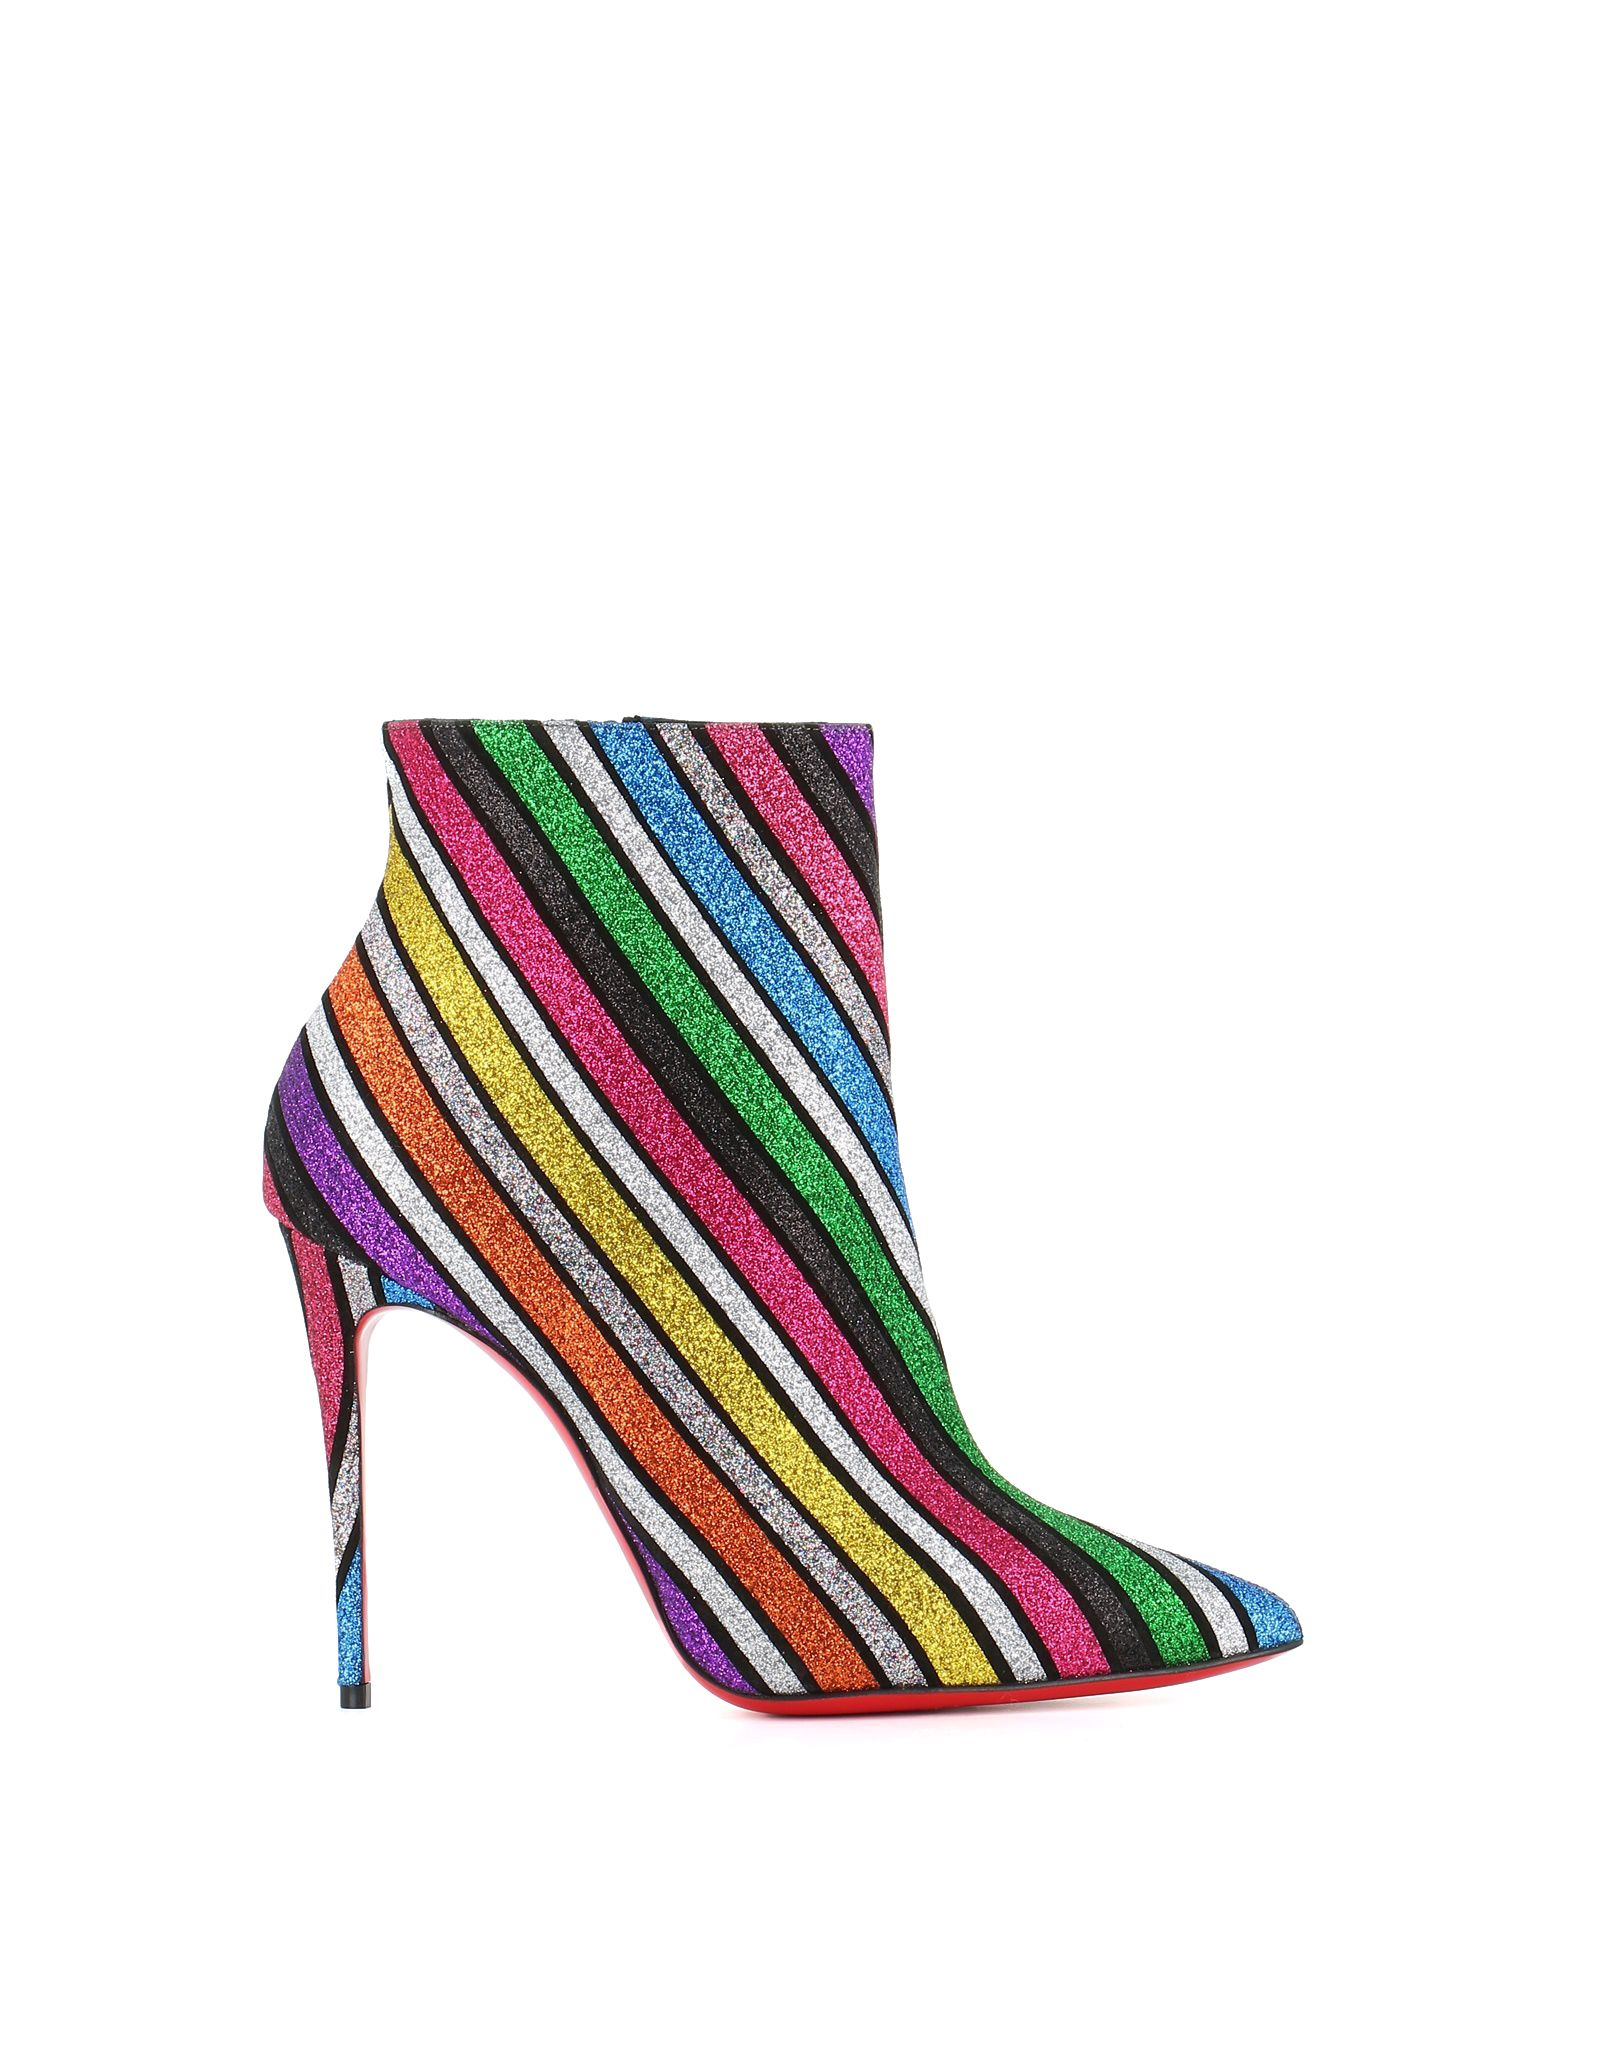 d574d294e82 Shop Christian Louboutin Boots on sale at the Marie Claire Edit